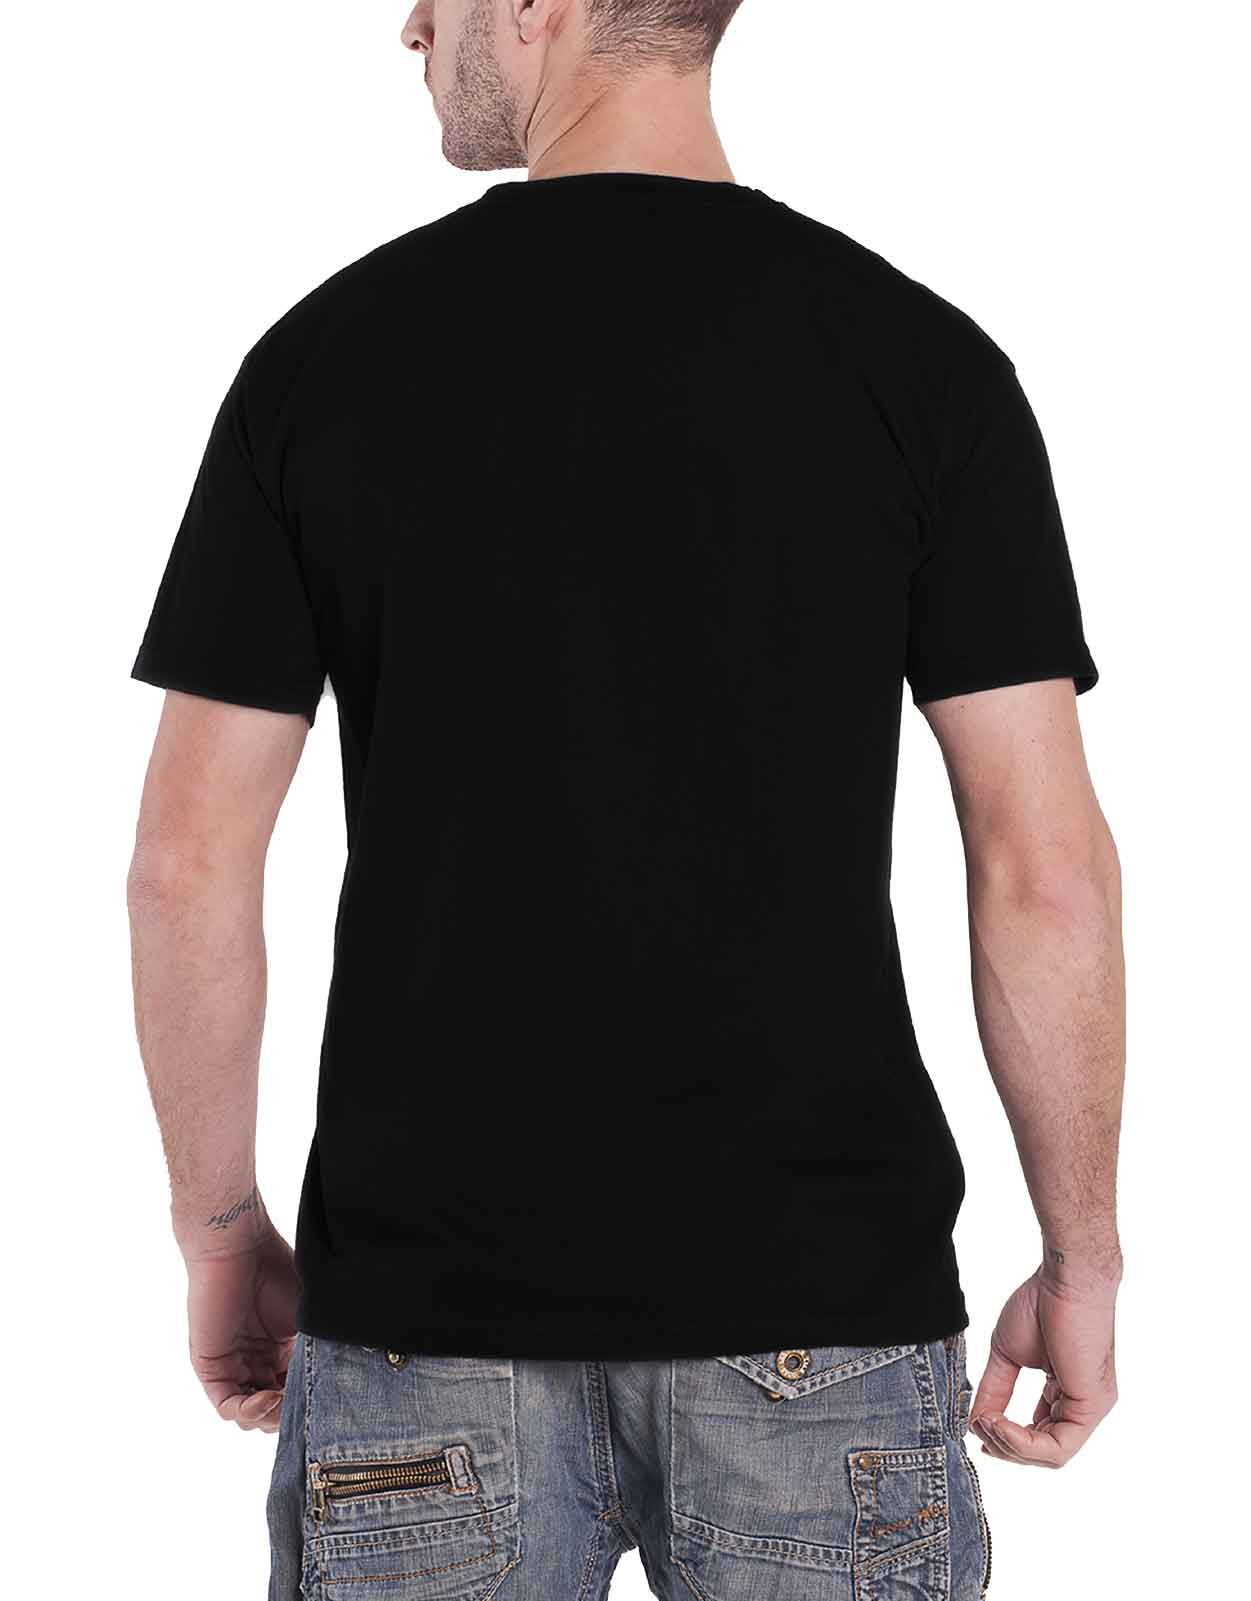 Officiel-Metallica-T-shirt-filaire-justice-for-all-RTL-Band-Logo-Homme-Nouveau miniature 23